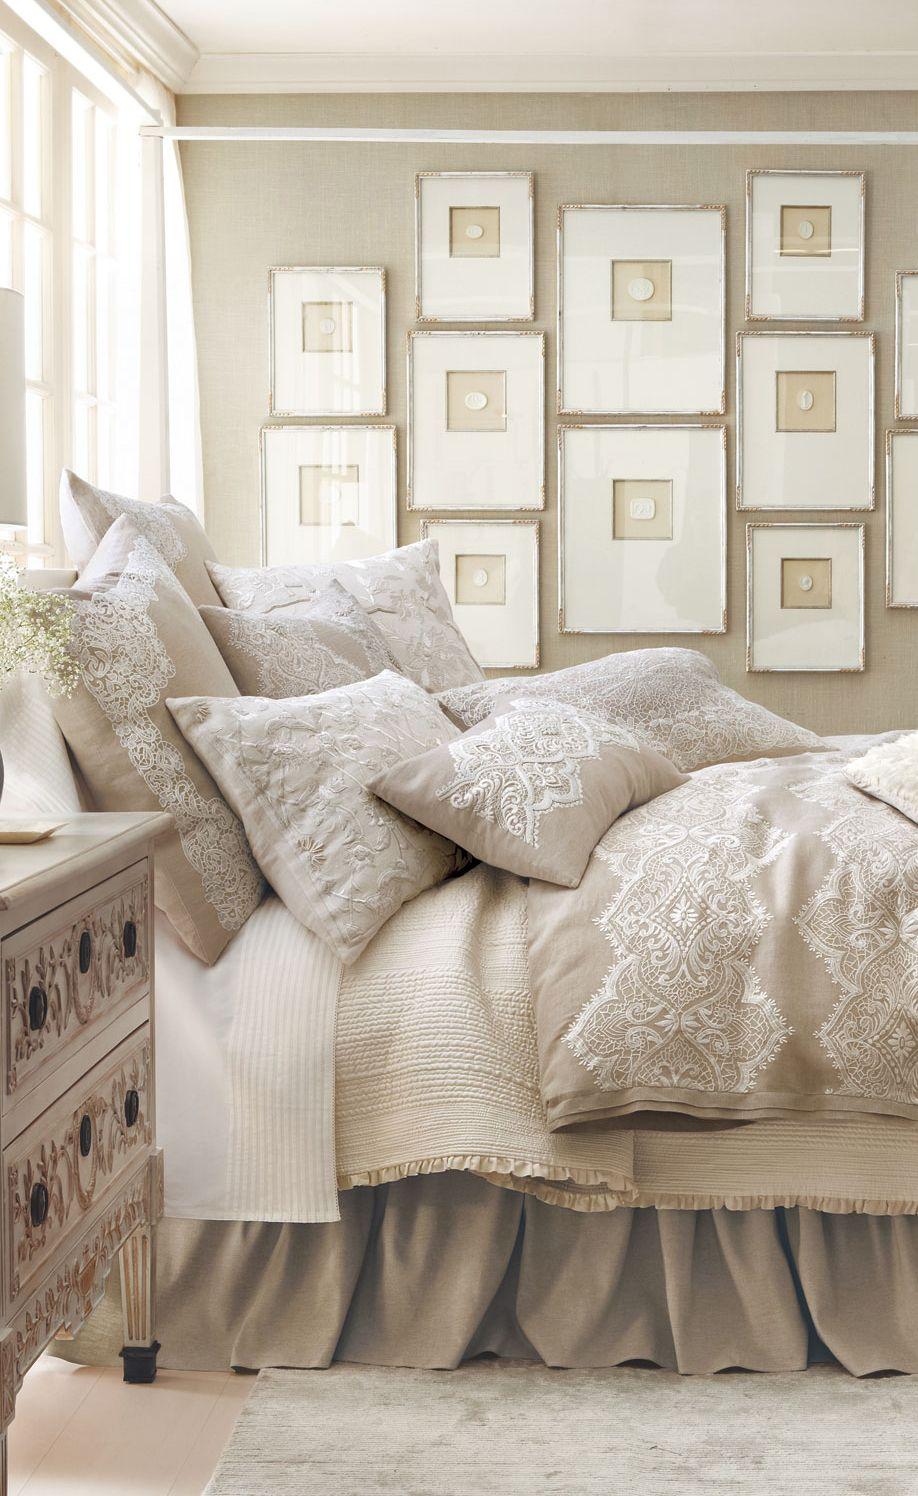 Callisto Home Bedding Bedrooms BEDDING Pinterest